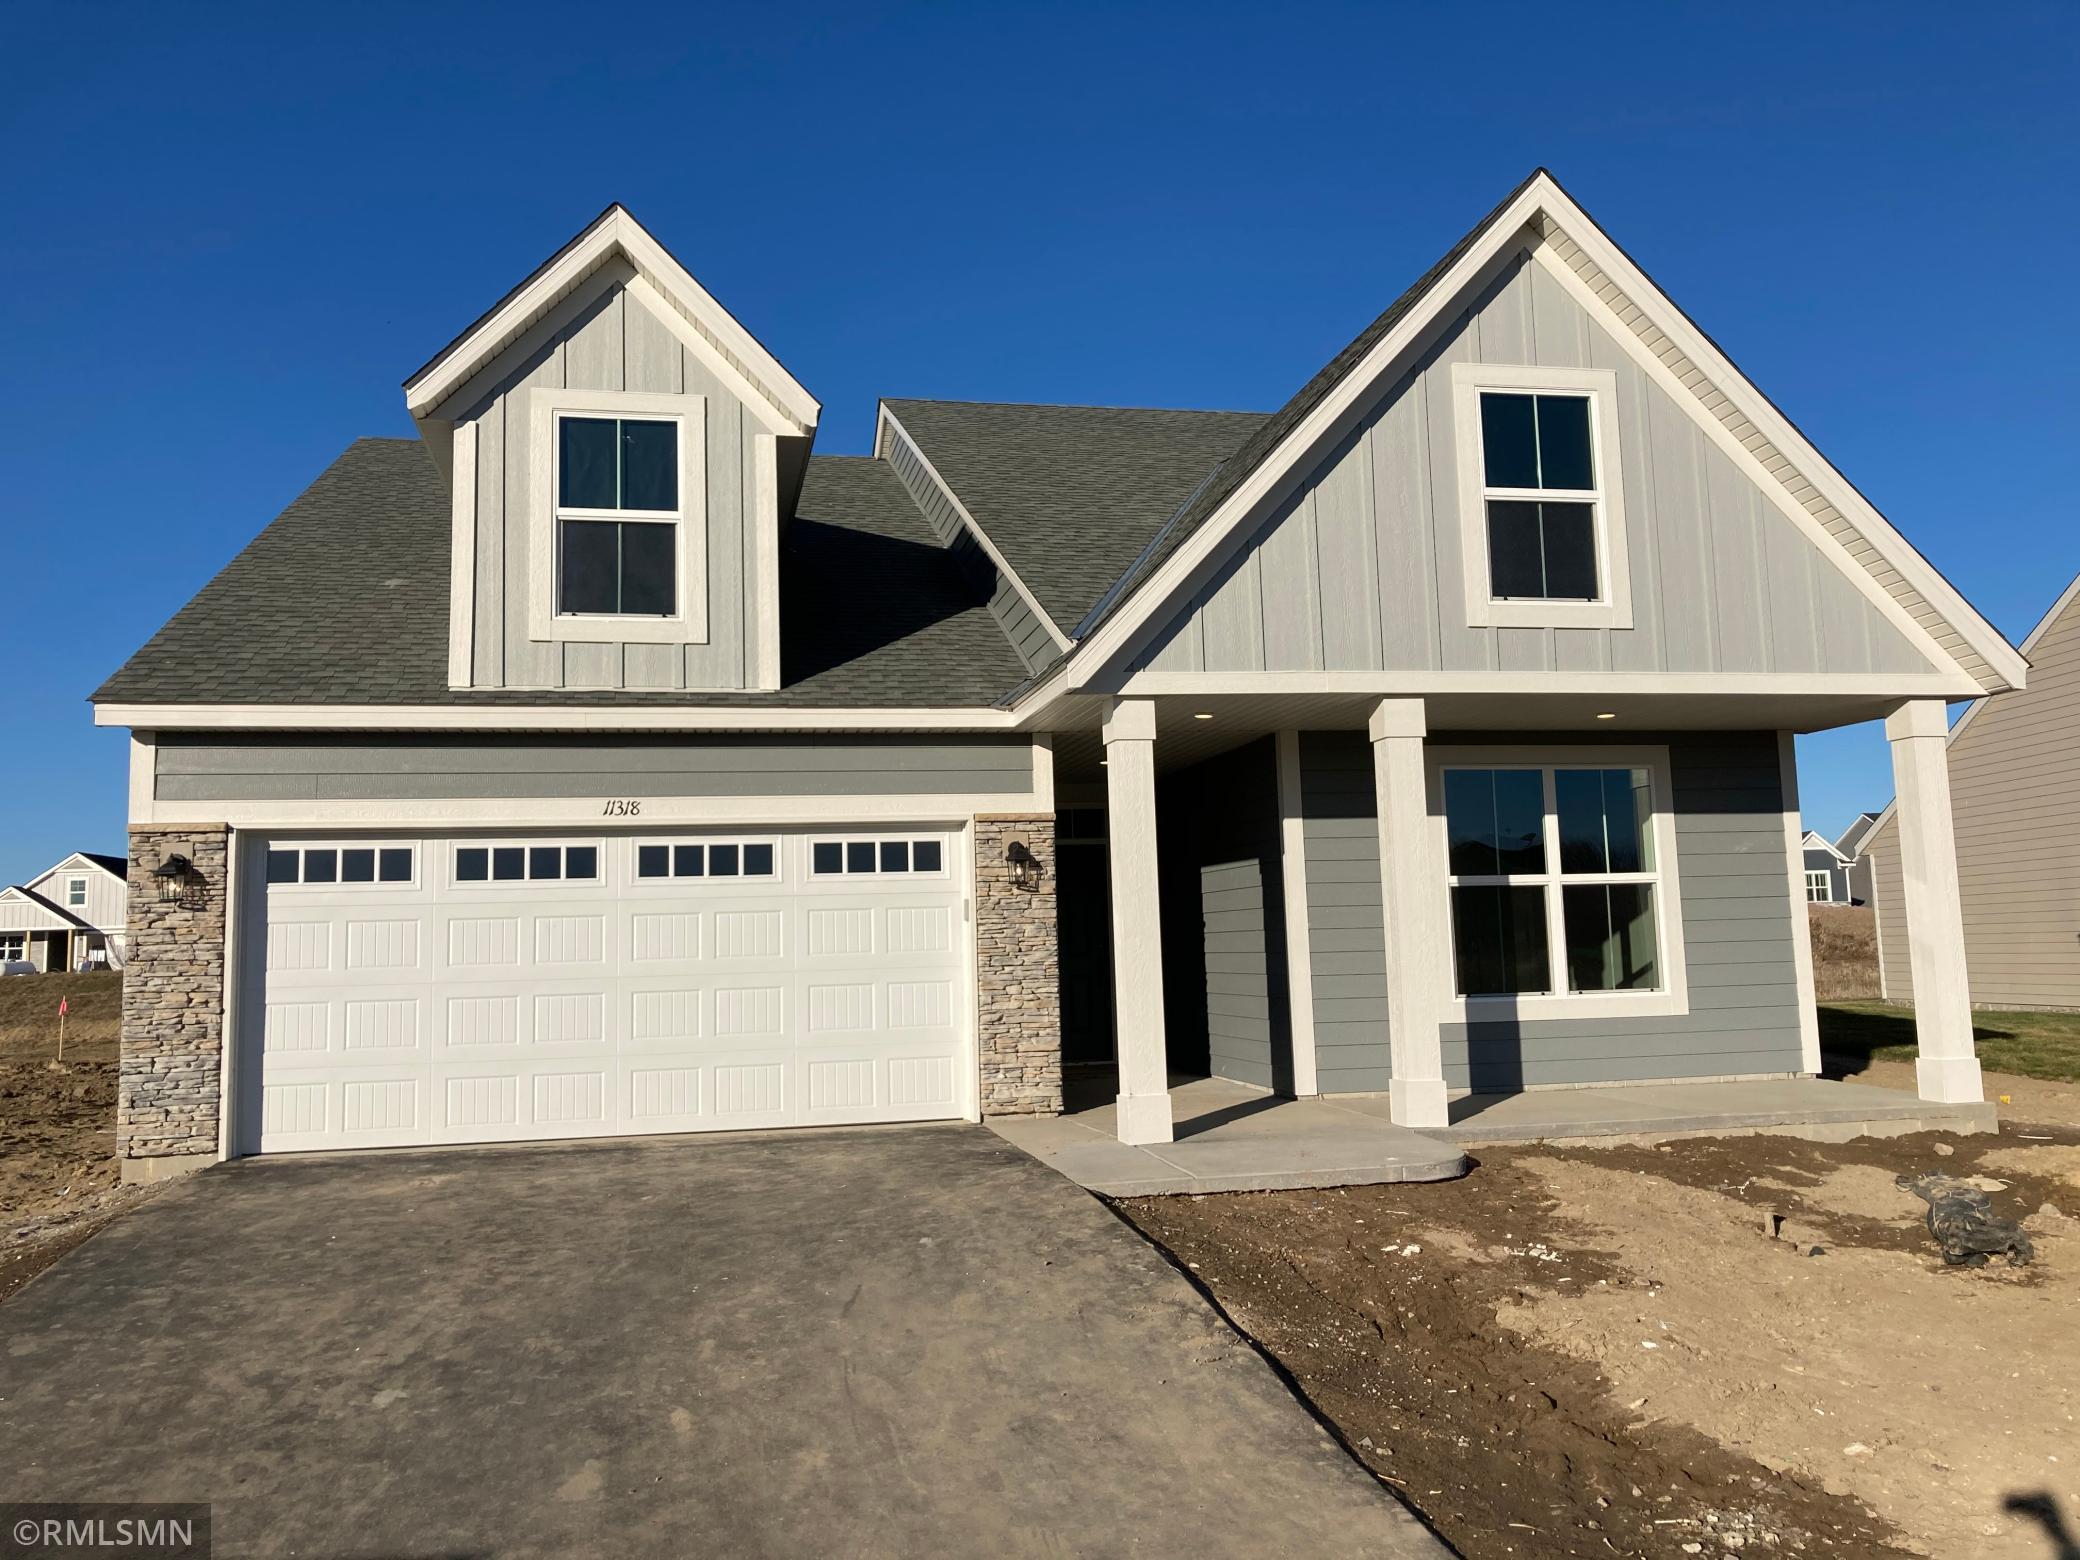 11318 Linden Way Ne, Albertville MN 55301 - Photo 1